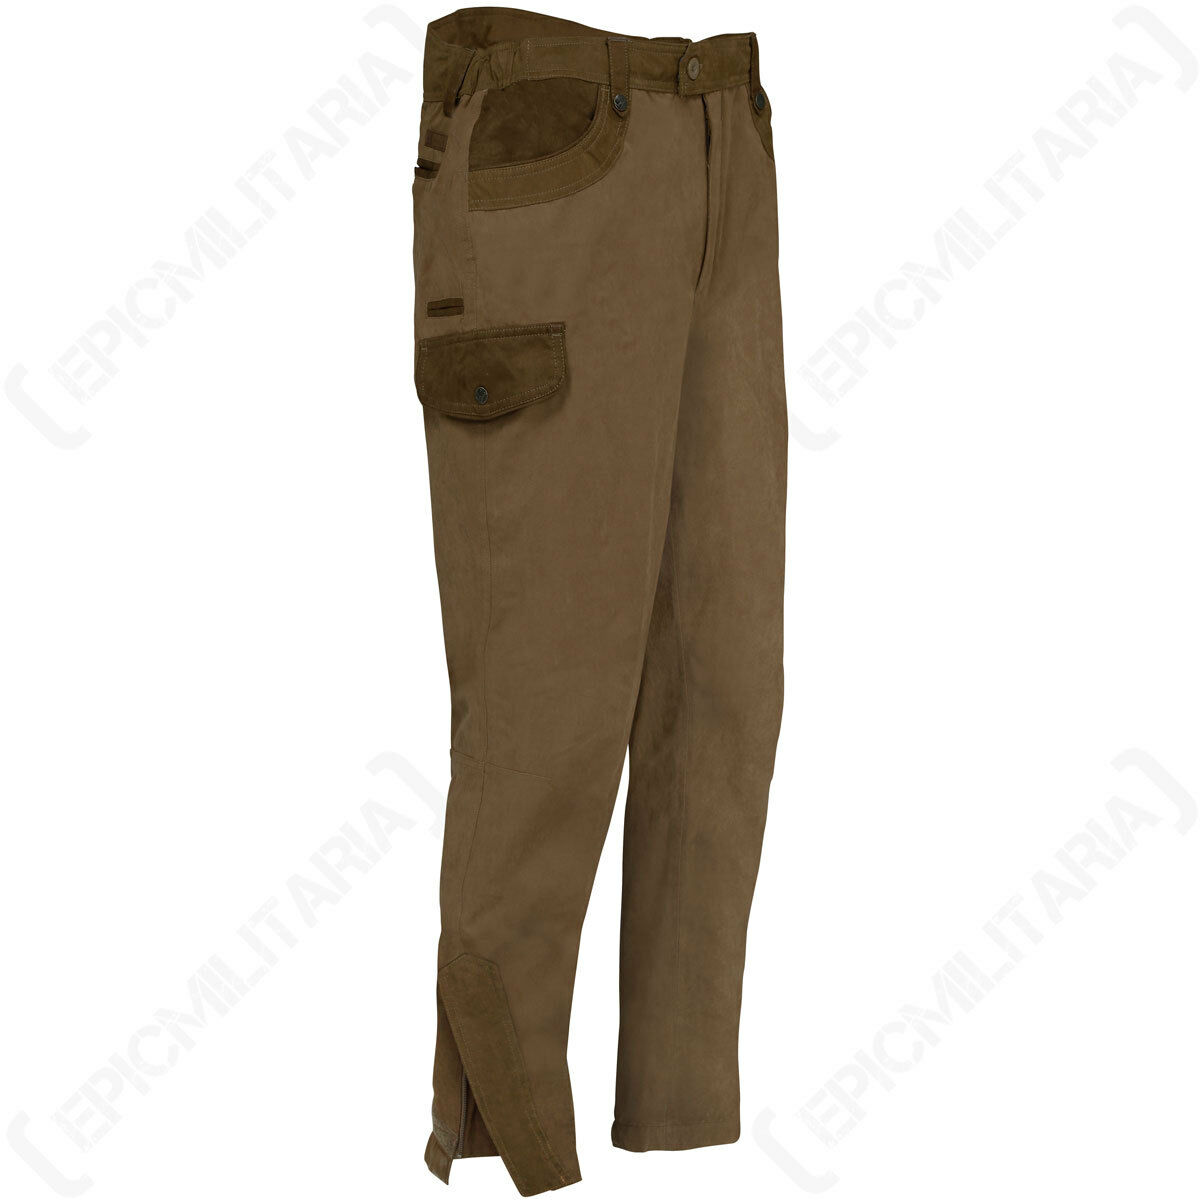 Rambouillet Caccia Pantaloni Bronzo - Impermeabile Inverno Tiro Pesca Pantaloni